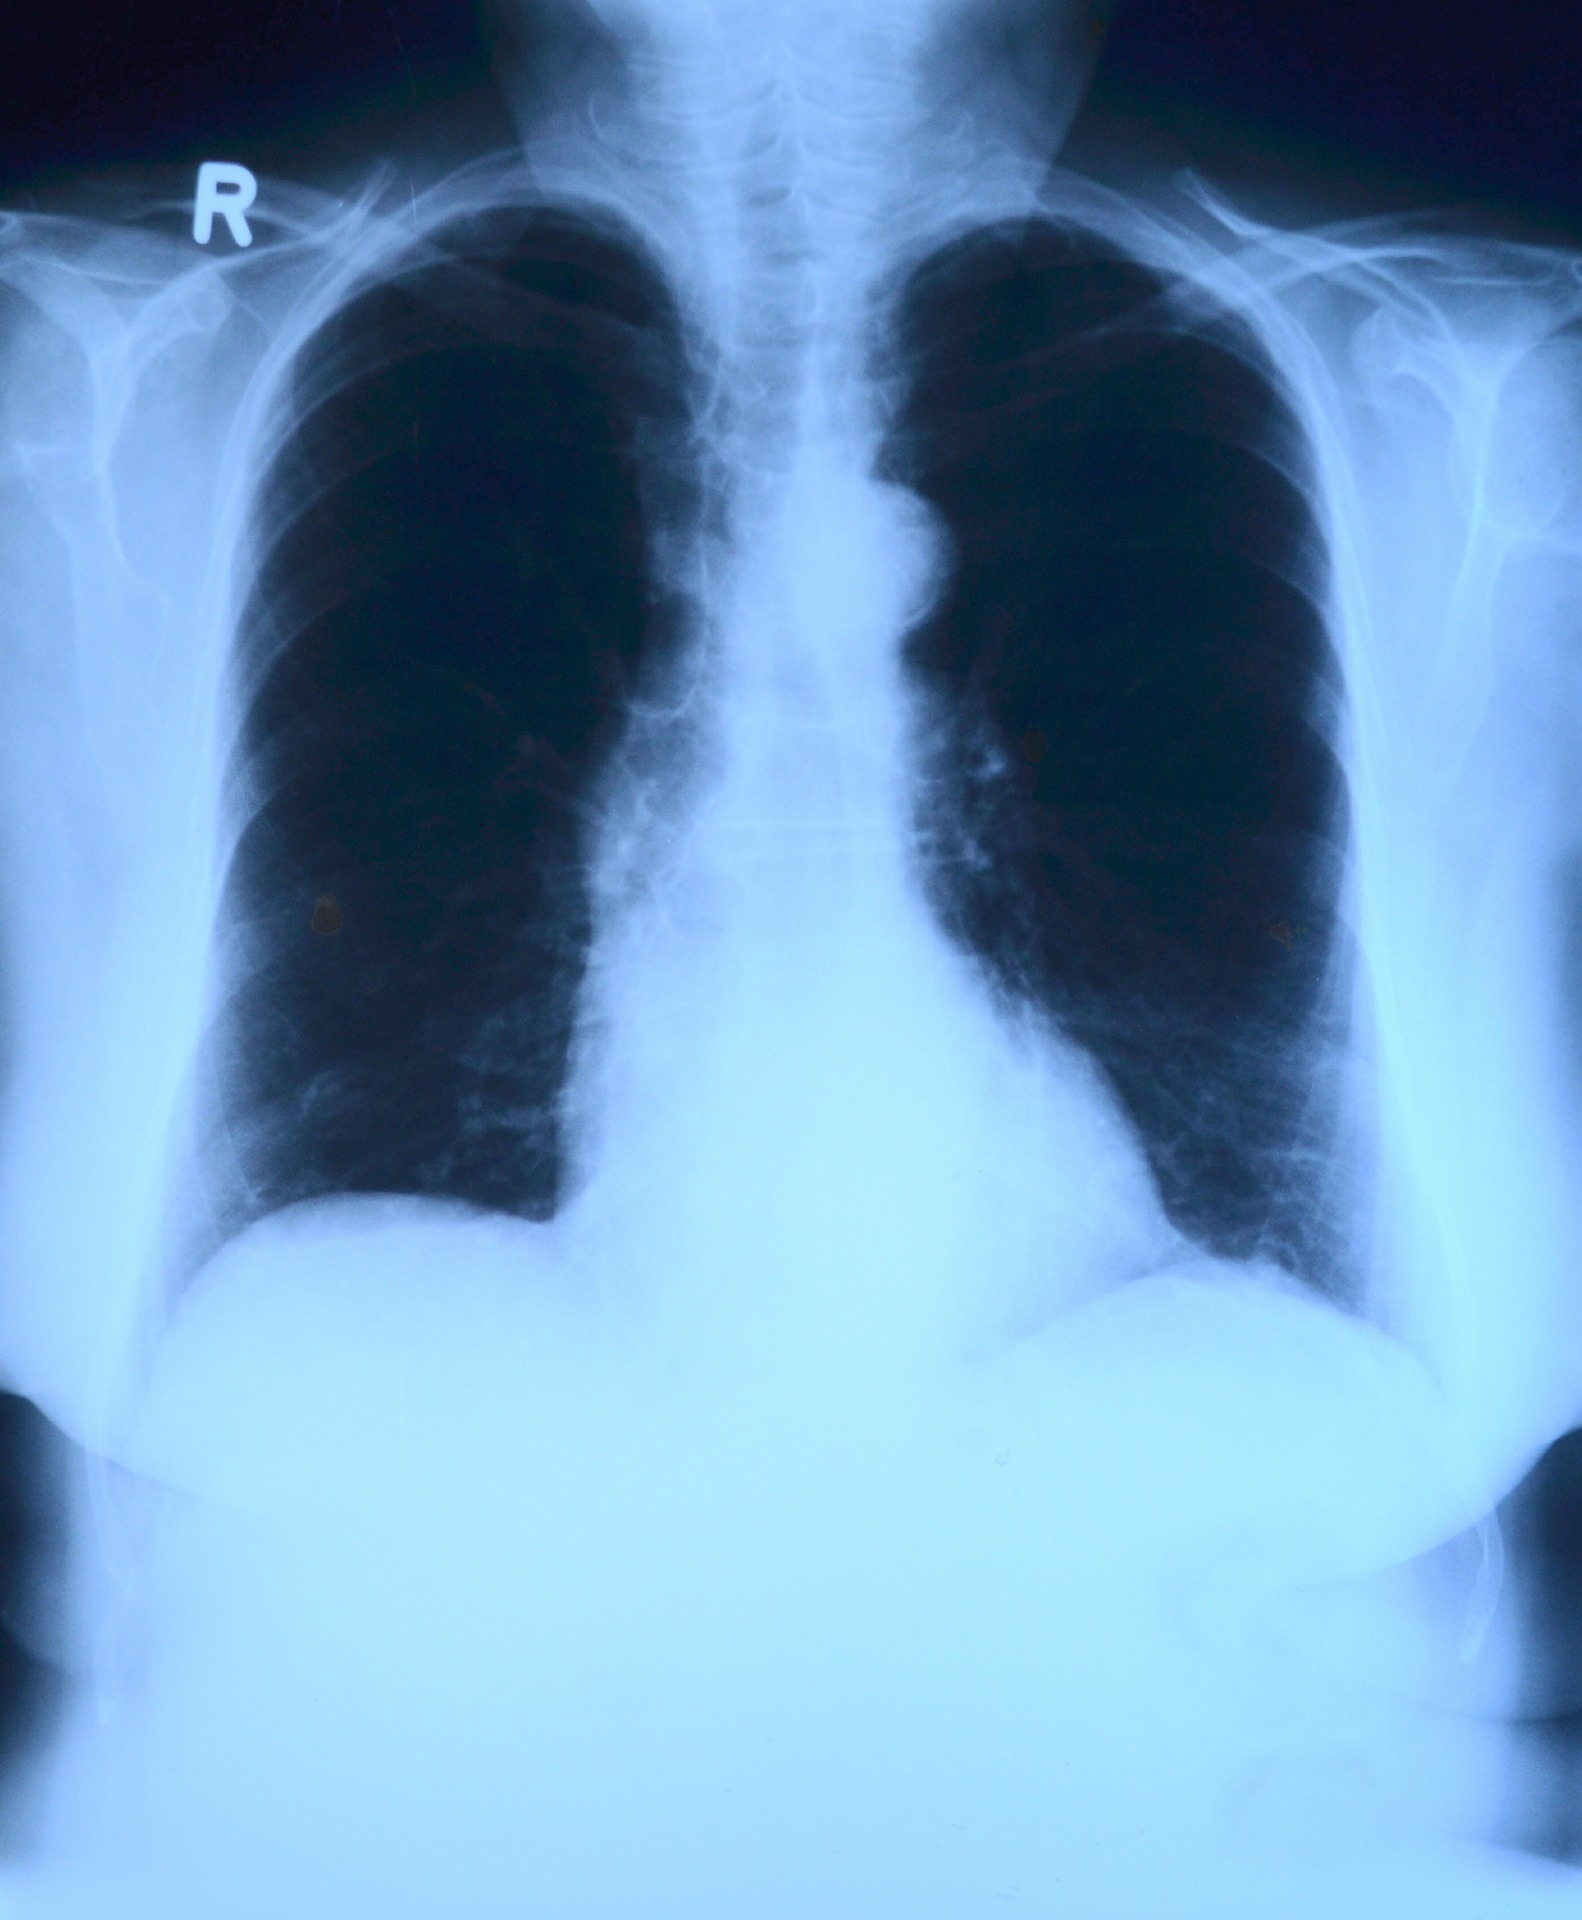 x-ray-image-568241_1920.jpg